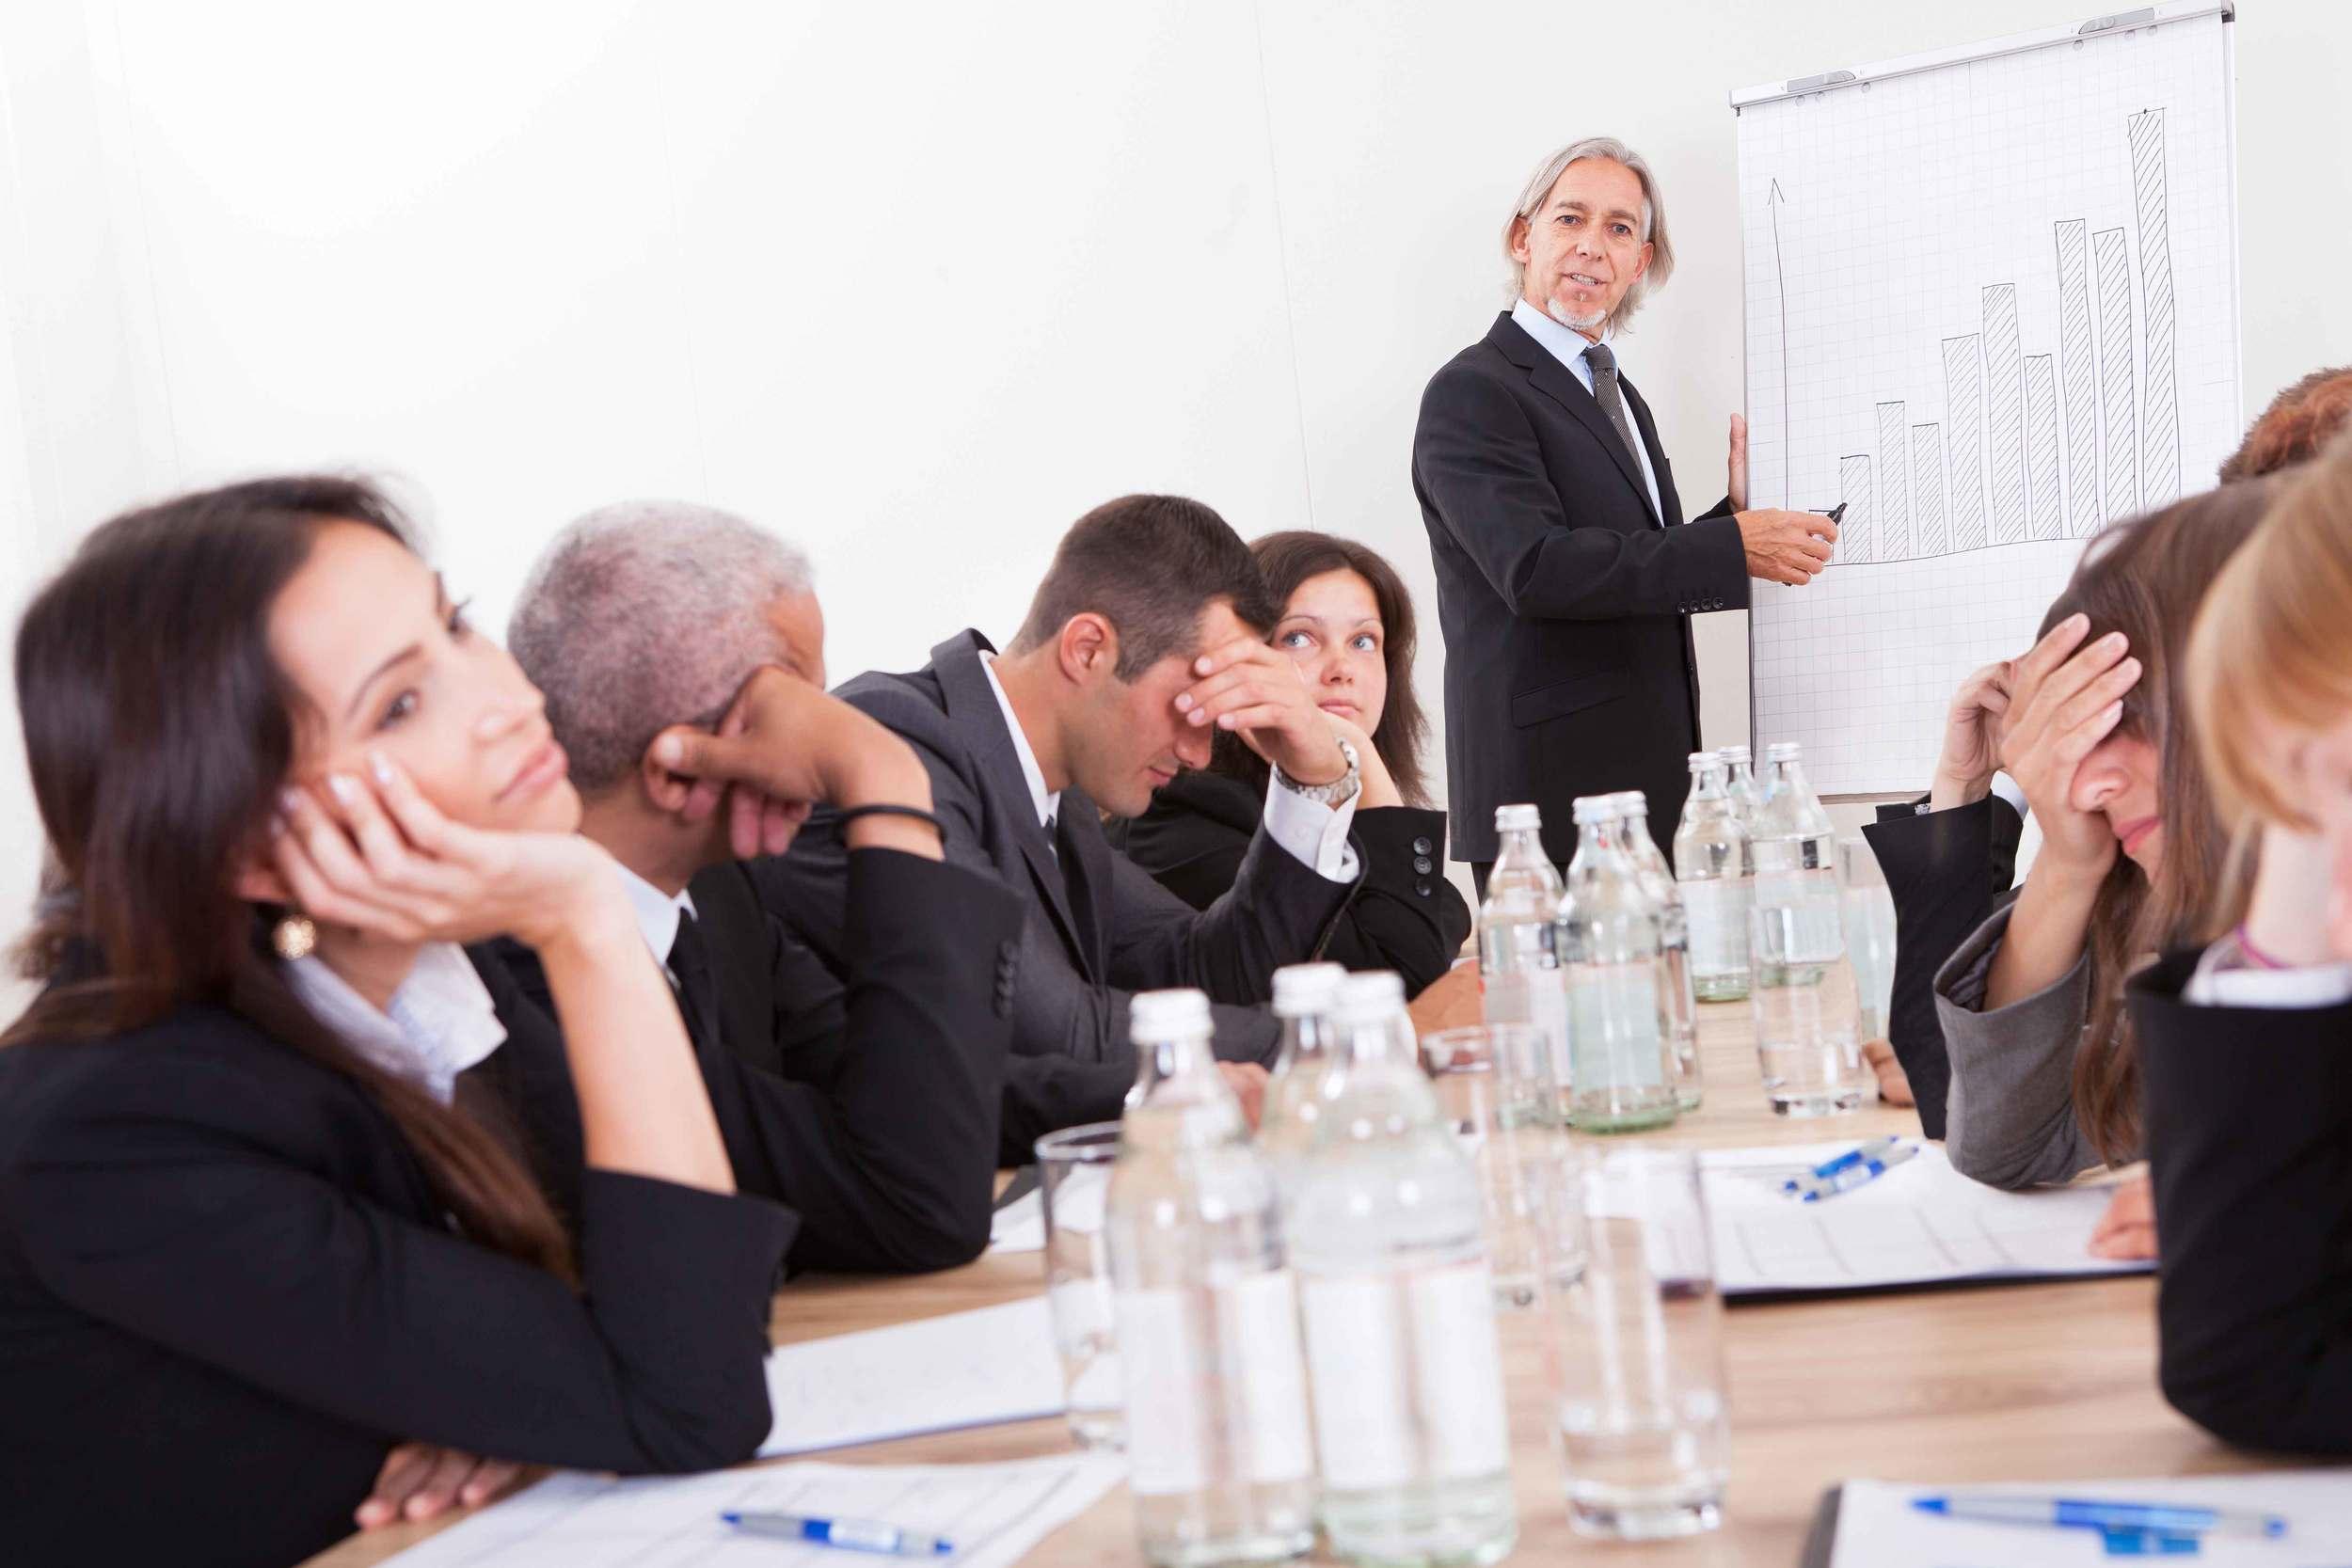 Presentations three things to avoid